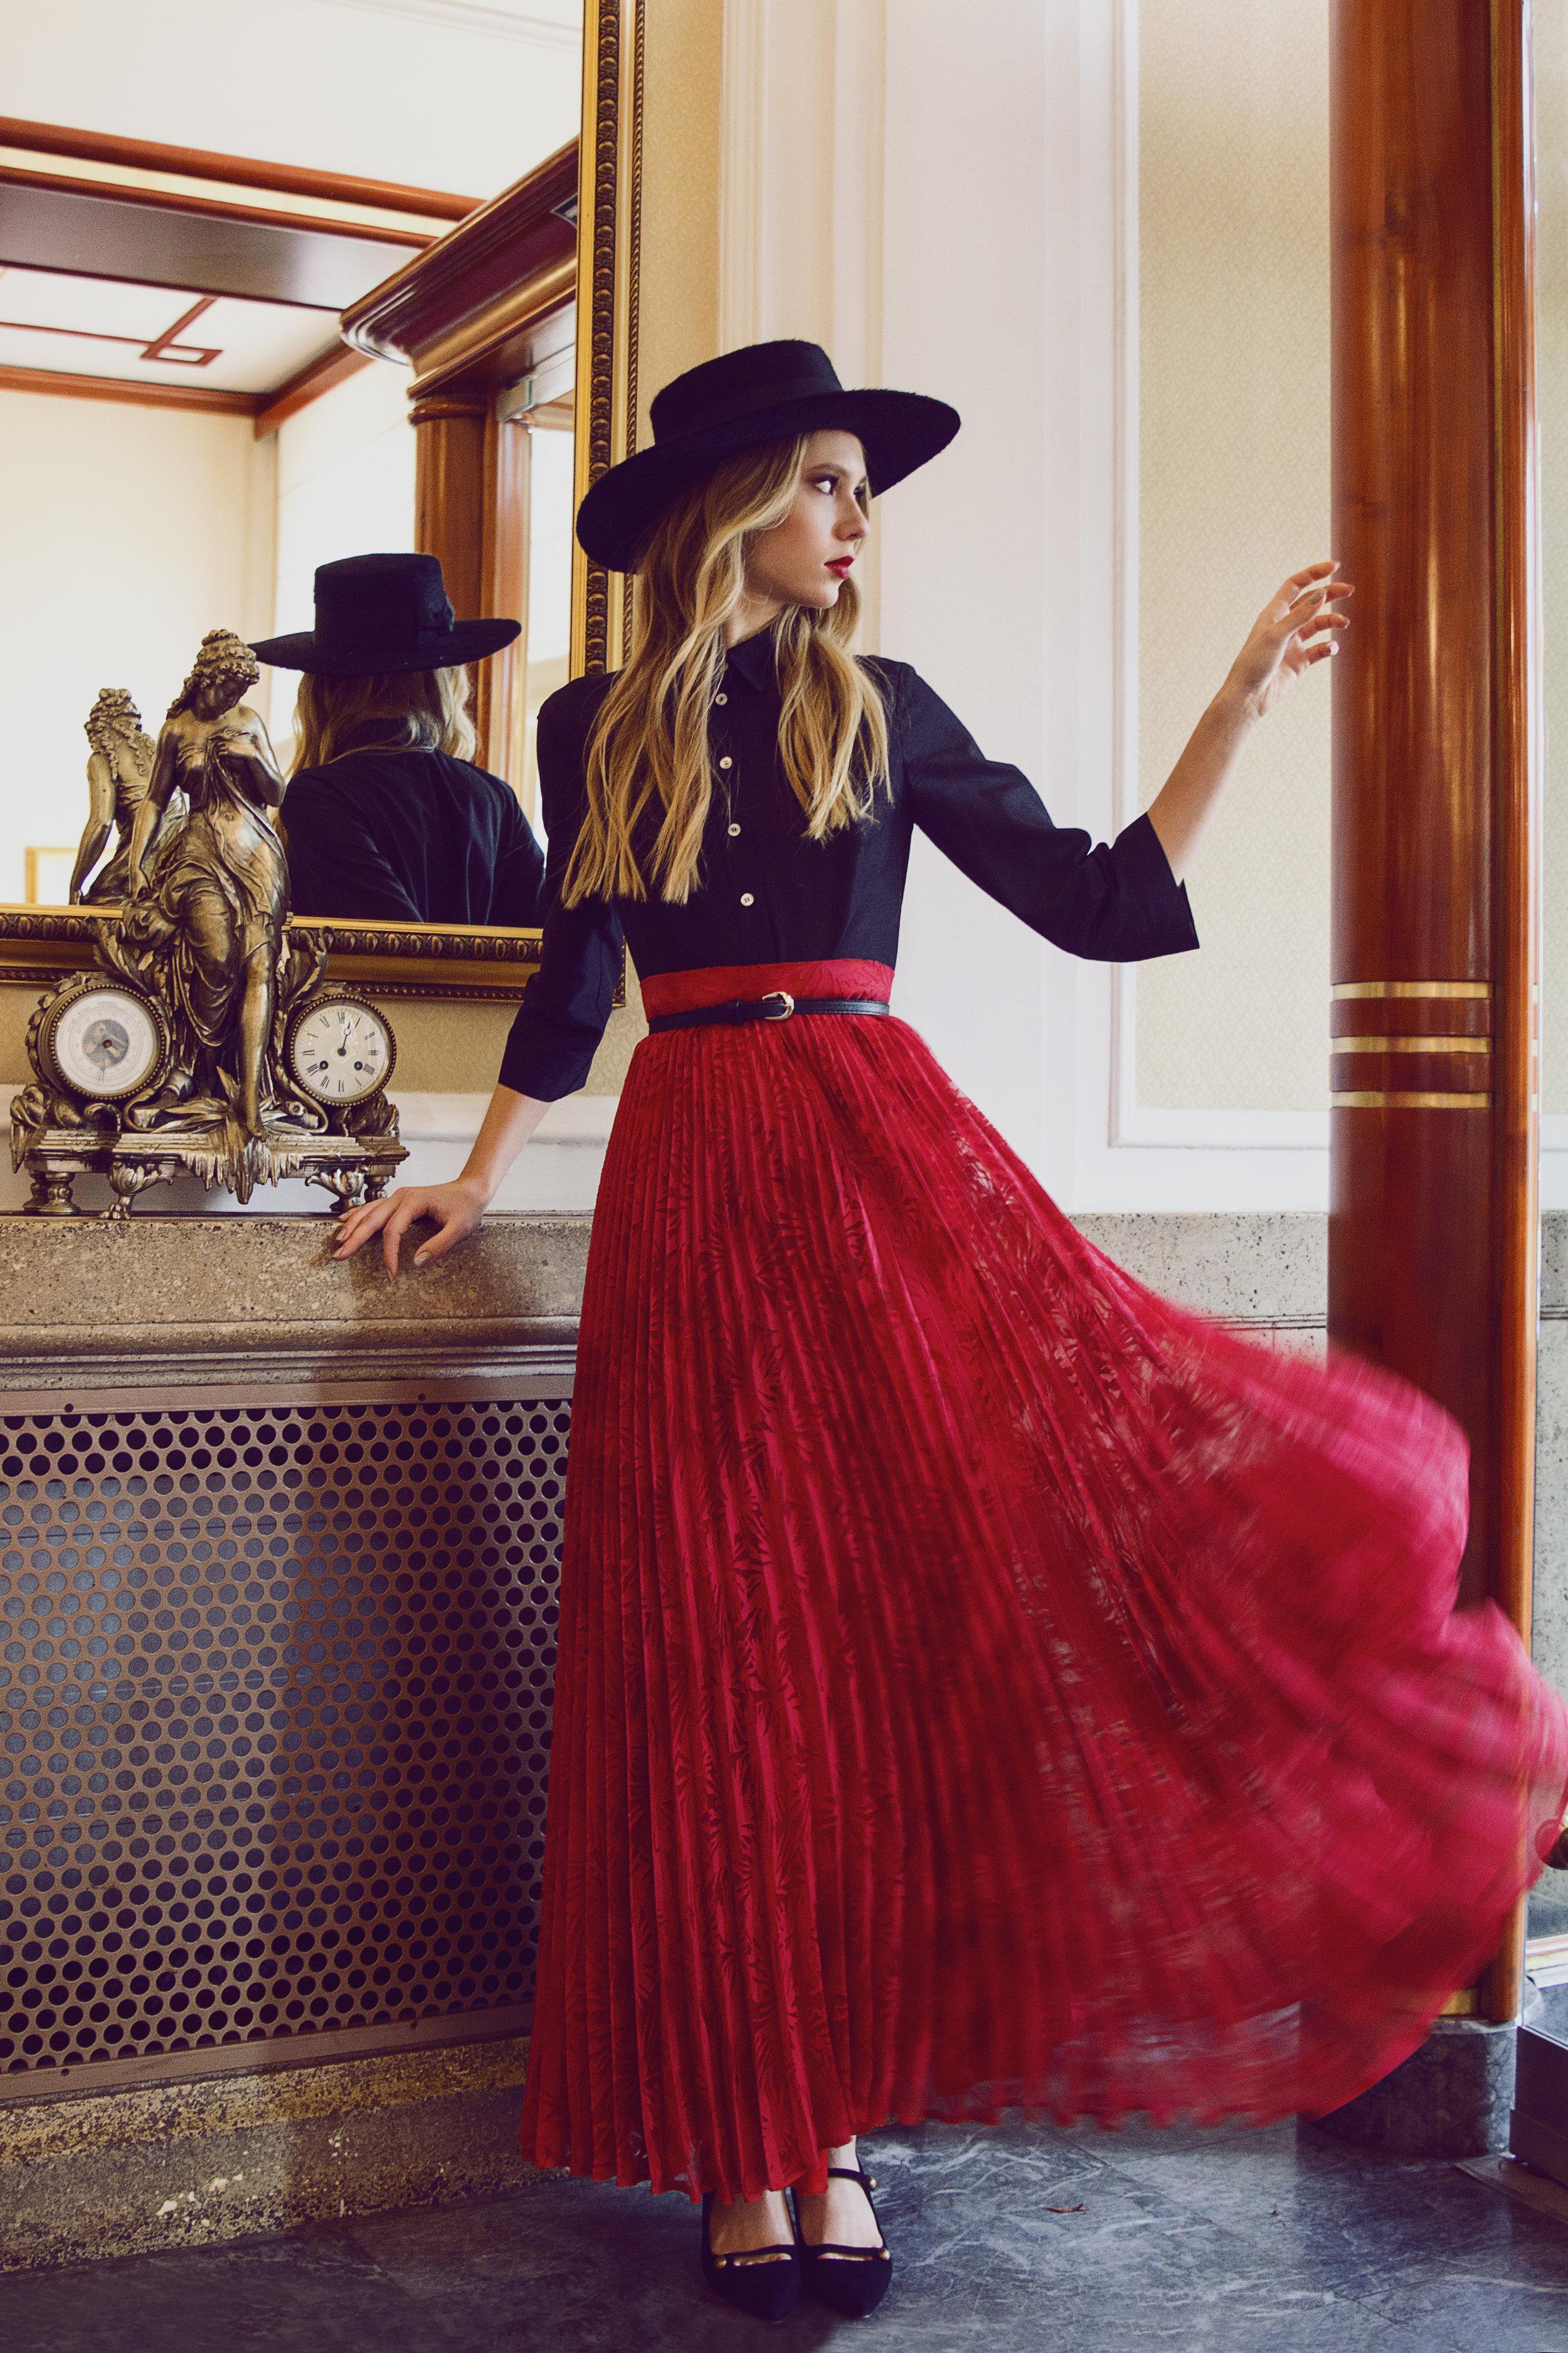 luka-lajic-fashion-photography-joliehr-hotel-palace-anamaria-ricov-robert-sever-loreta-gudelj-shoebox-talia-models (4).jpg